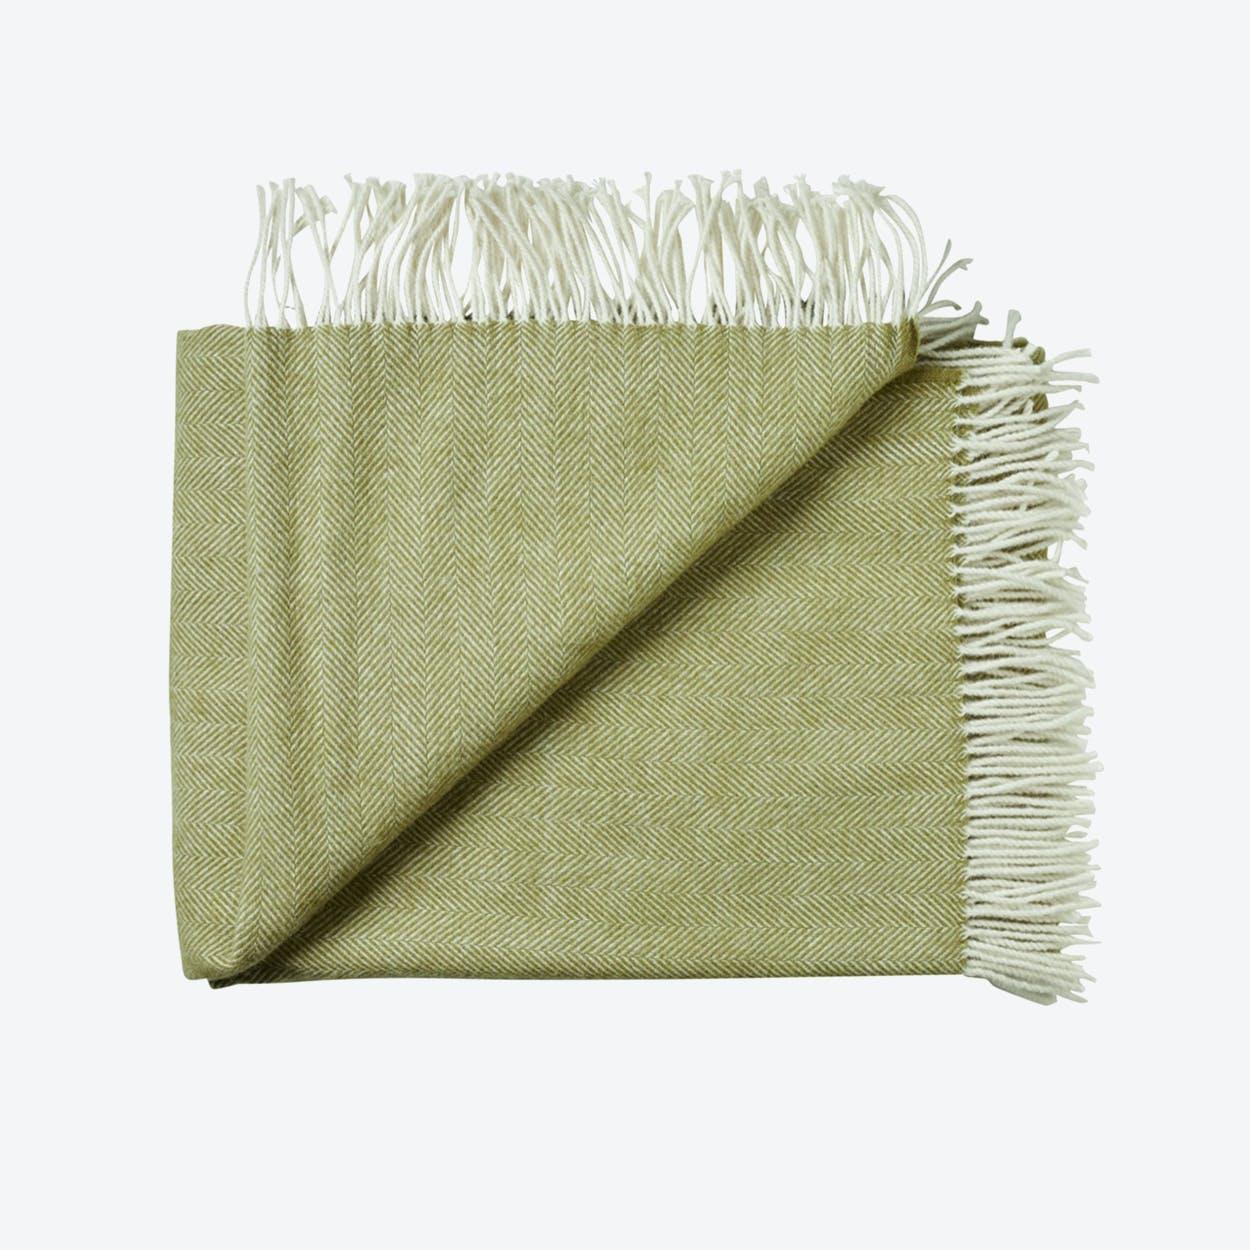 Sevilia Alpaca/Wool Throw in Green, Herringbone